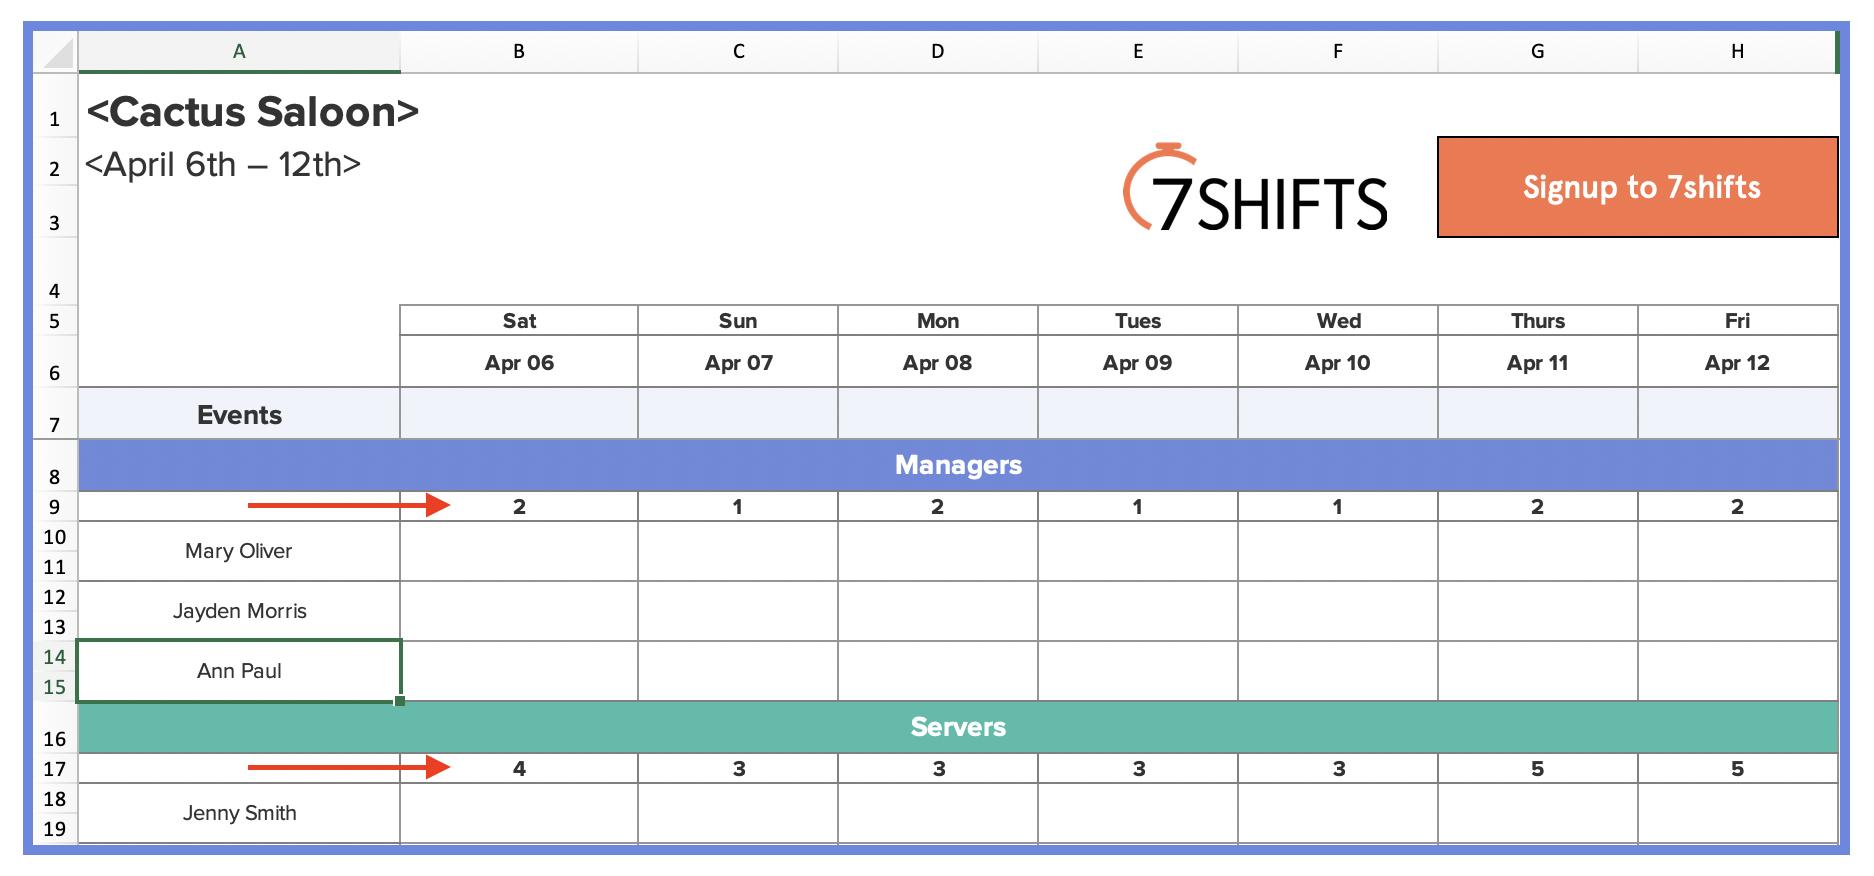 8-restaurant-scheduling-excel-template